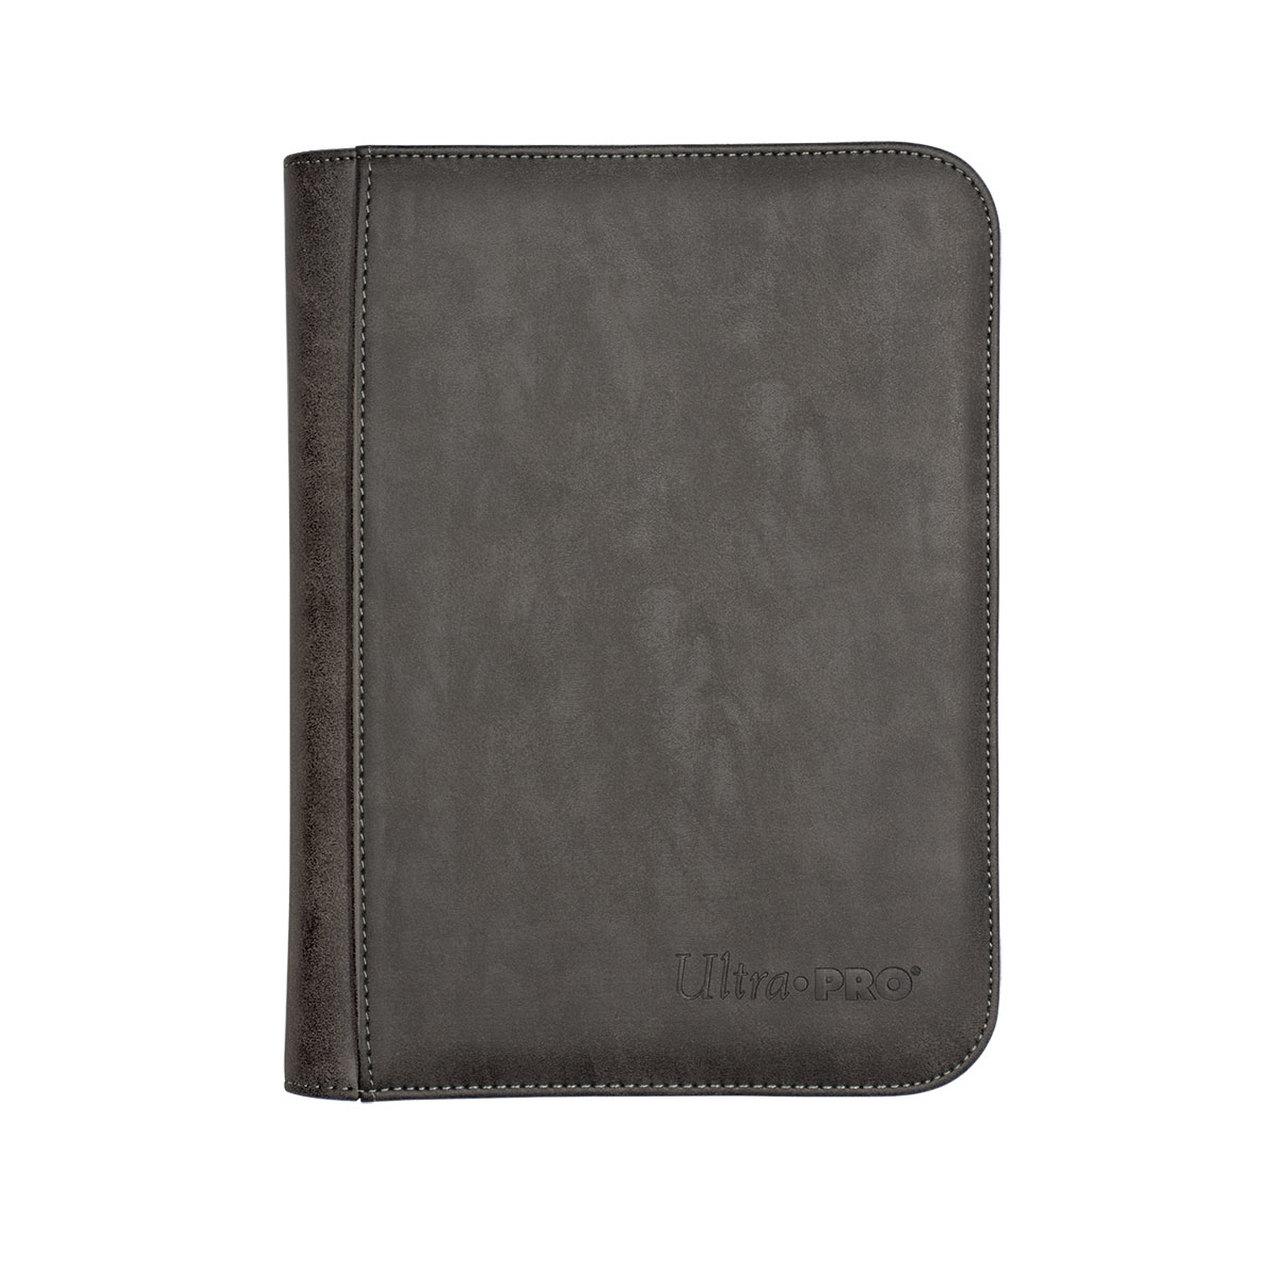 Pro-binder: Premium Zippered 4-pocket Suede Collection - Jet